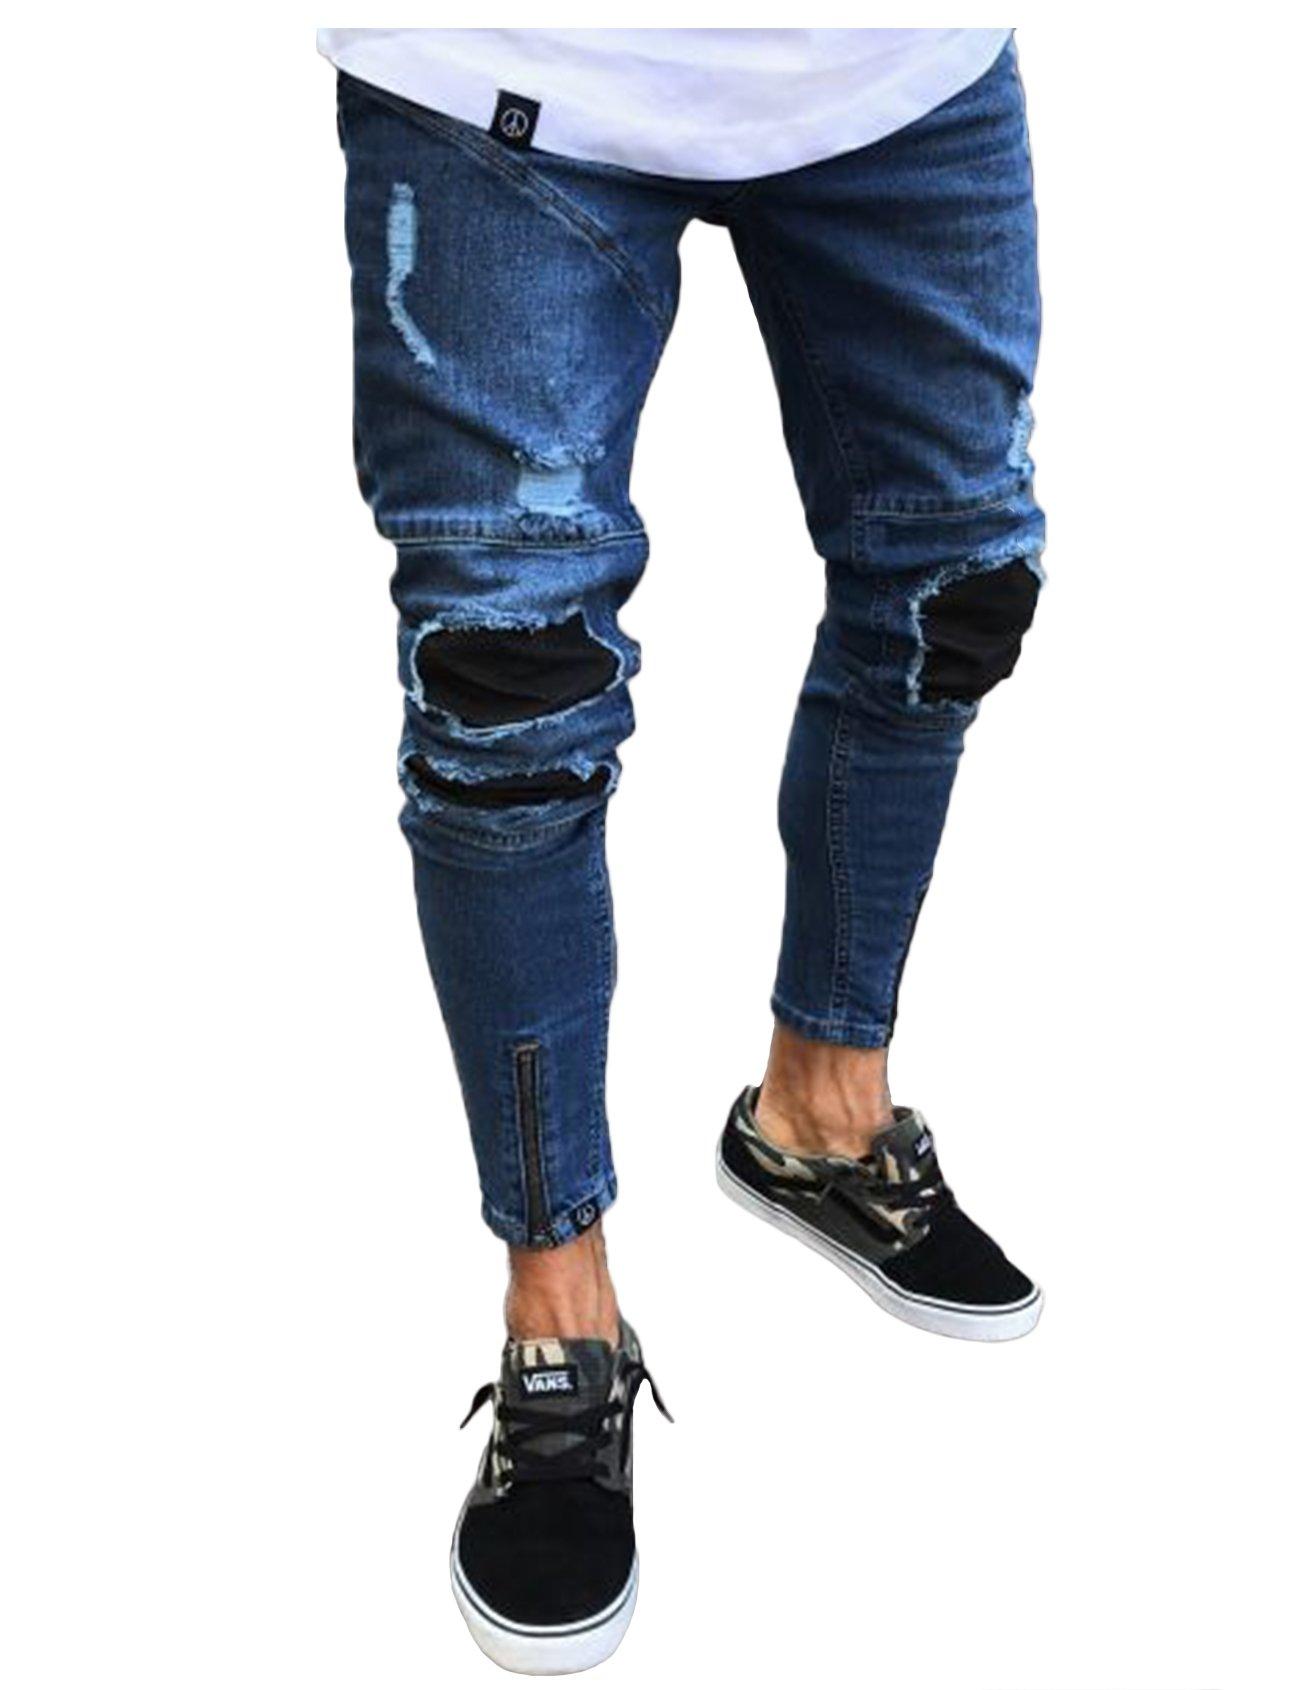 newrong Men's Ripped Slim Fit Jeans Pants XL Dark Blue